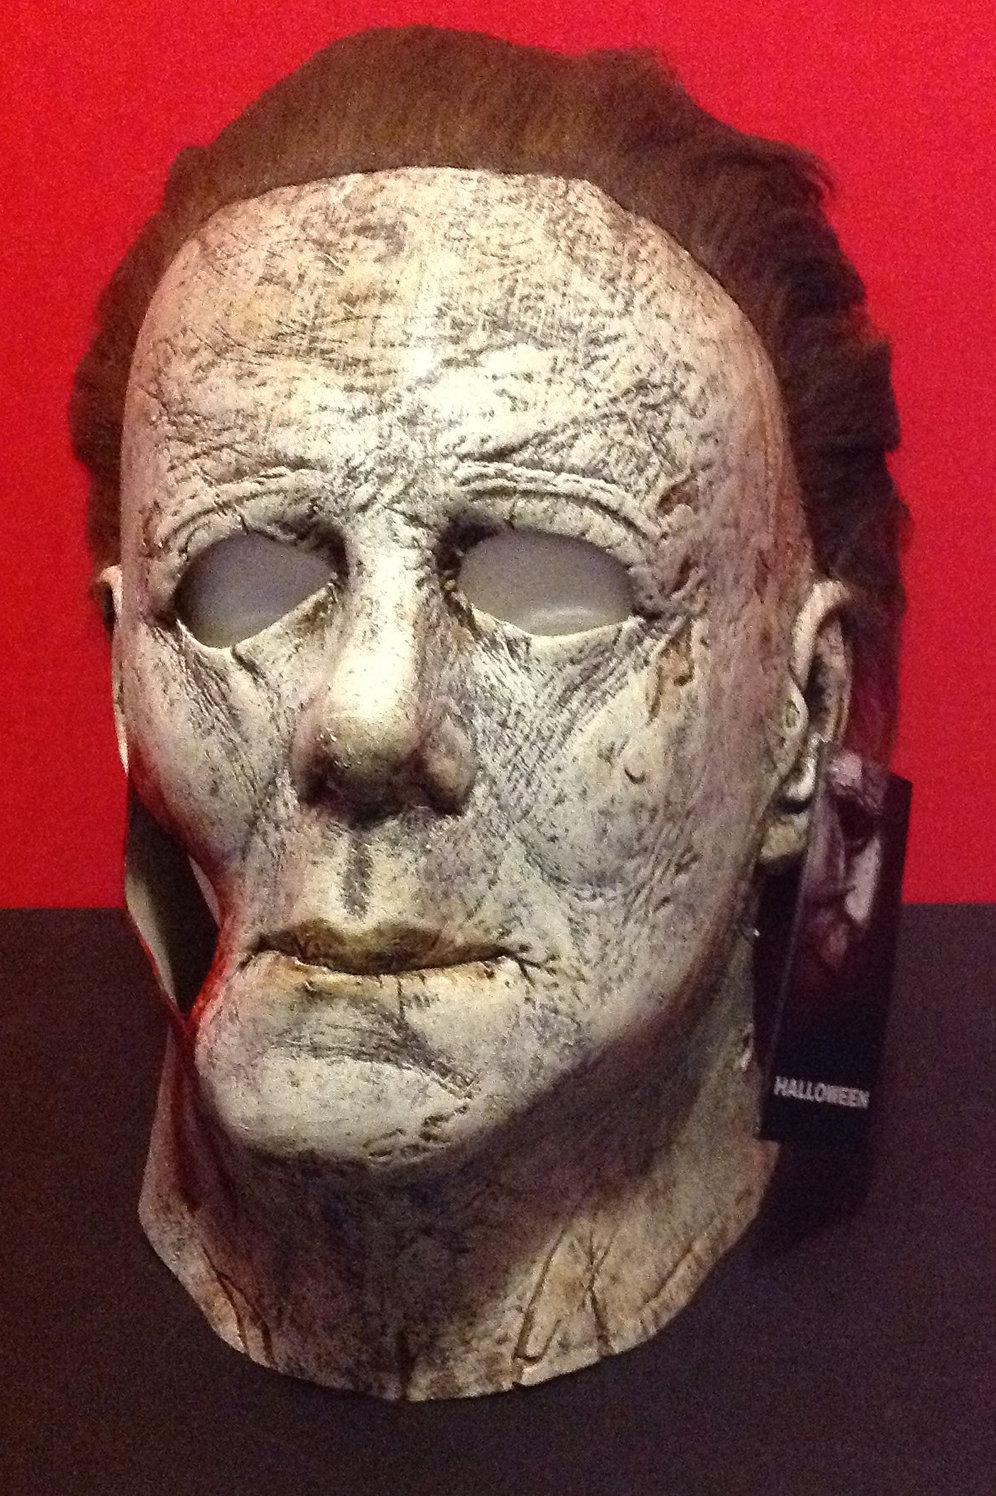 Halloween 2018 Michael Myers Mask.Halloween 2018 Bloody Edition Michael Myers Mask